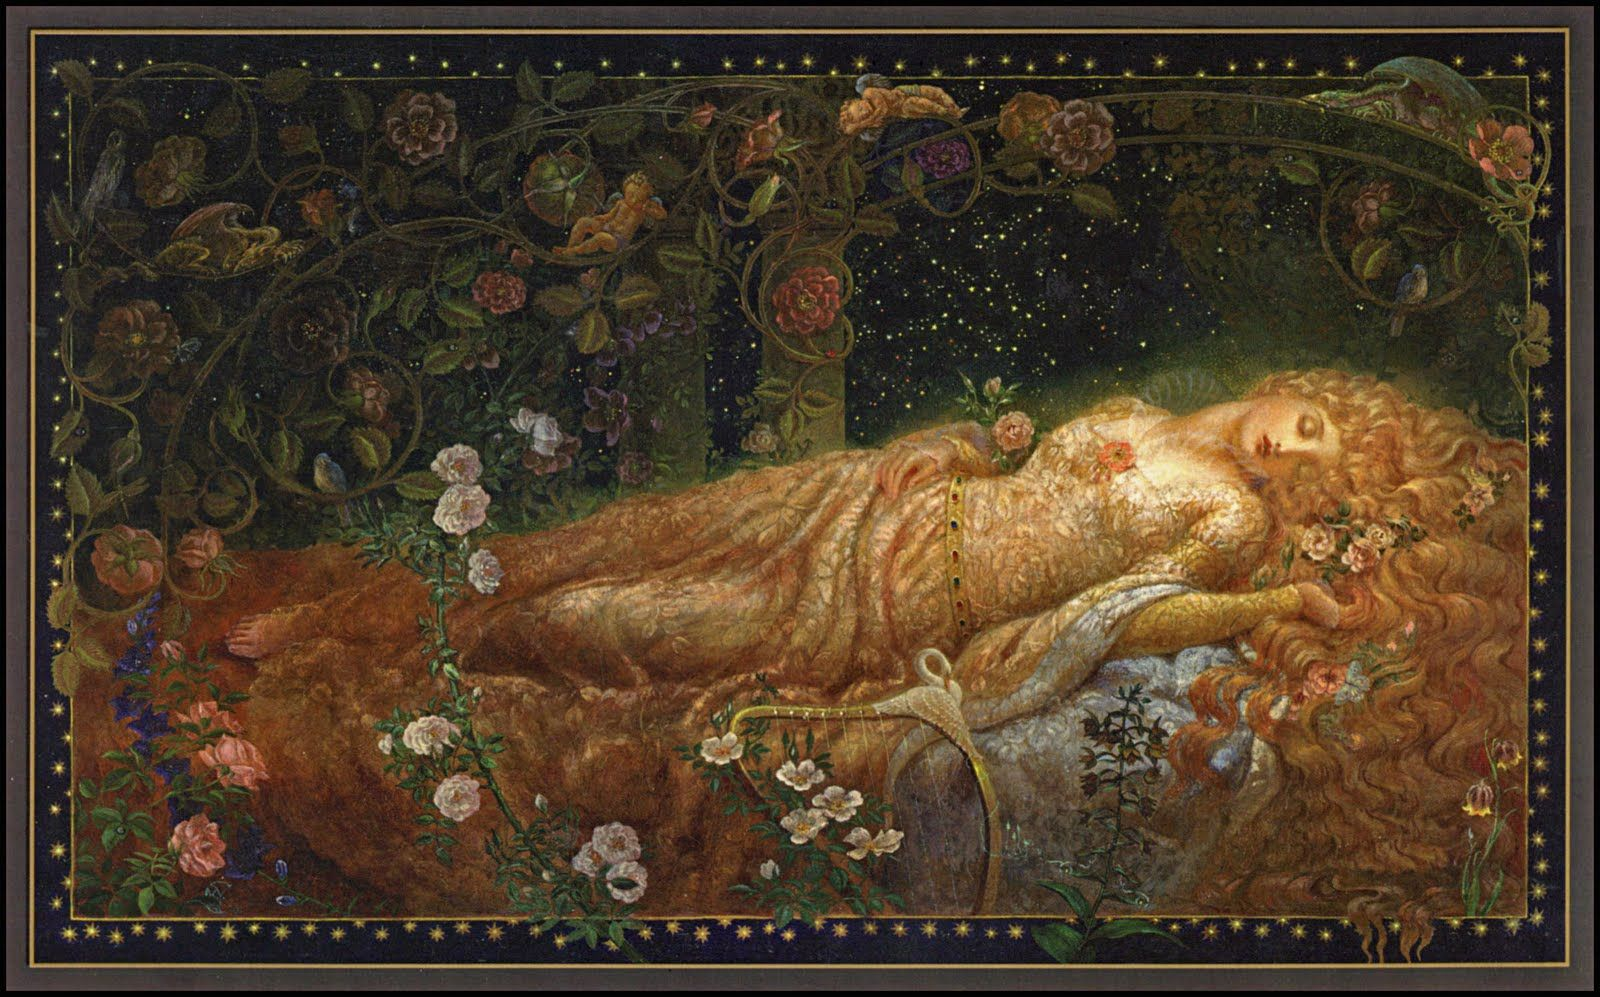 The Sleeping Beauty. Kynuko & Craft